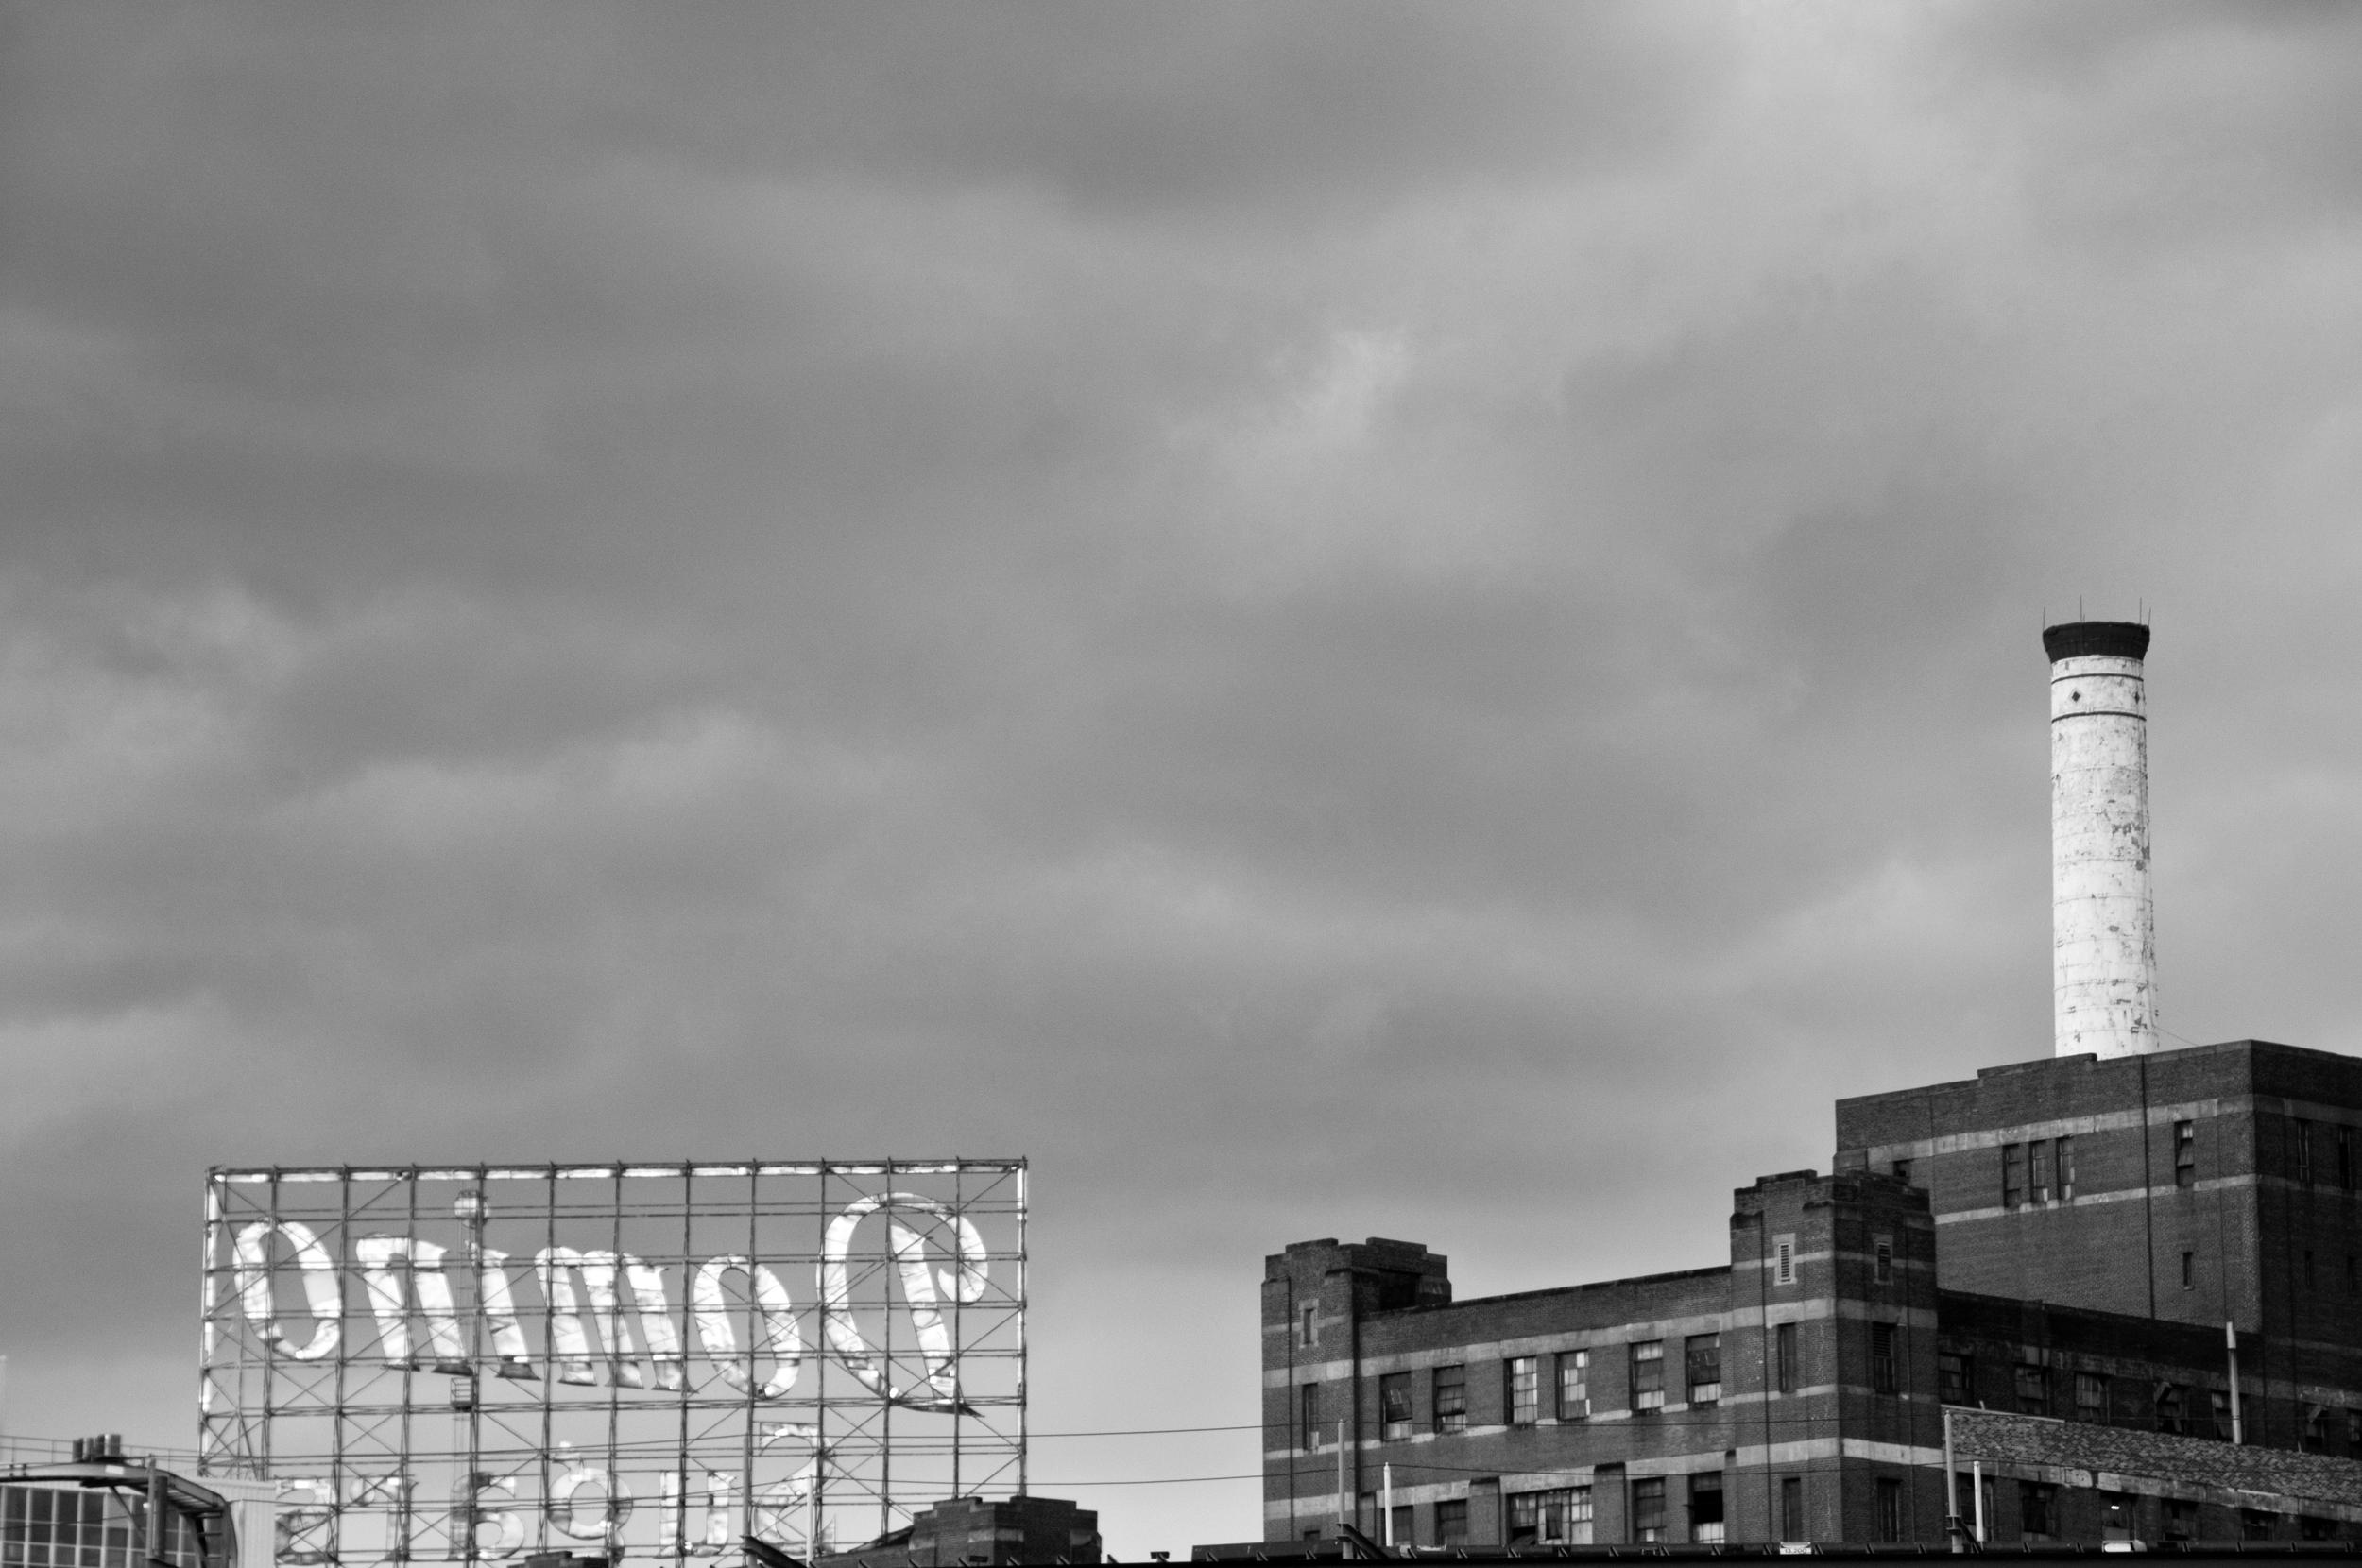 Domino sugar factory, Baltimore